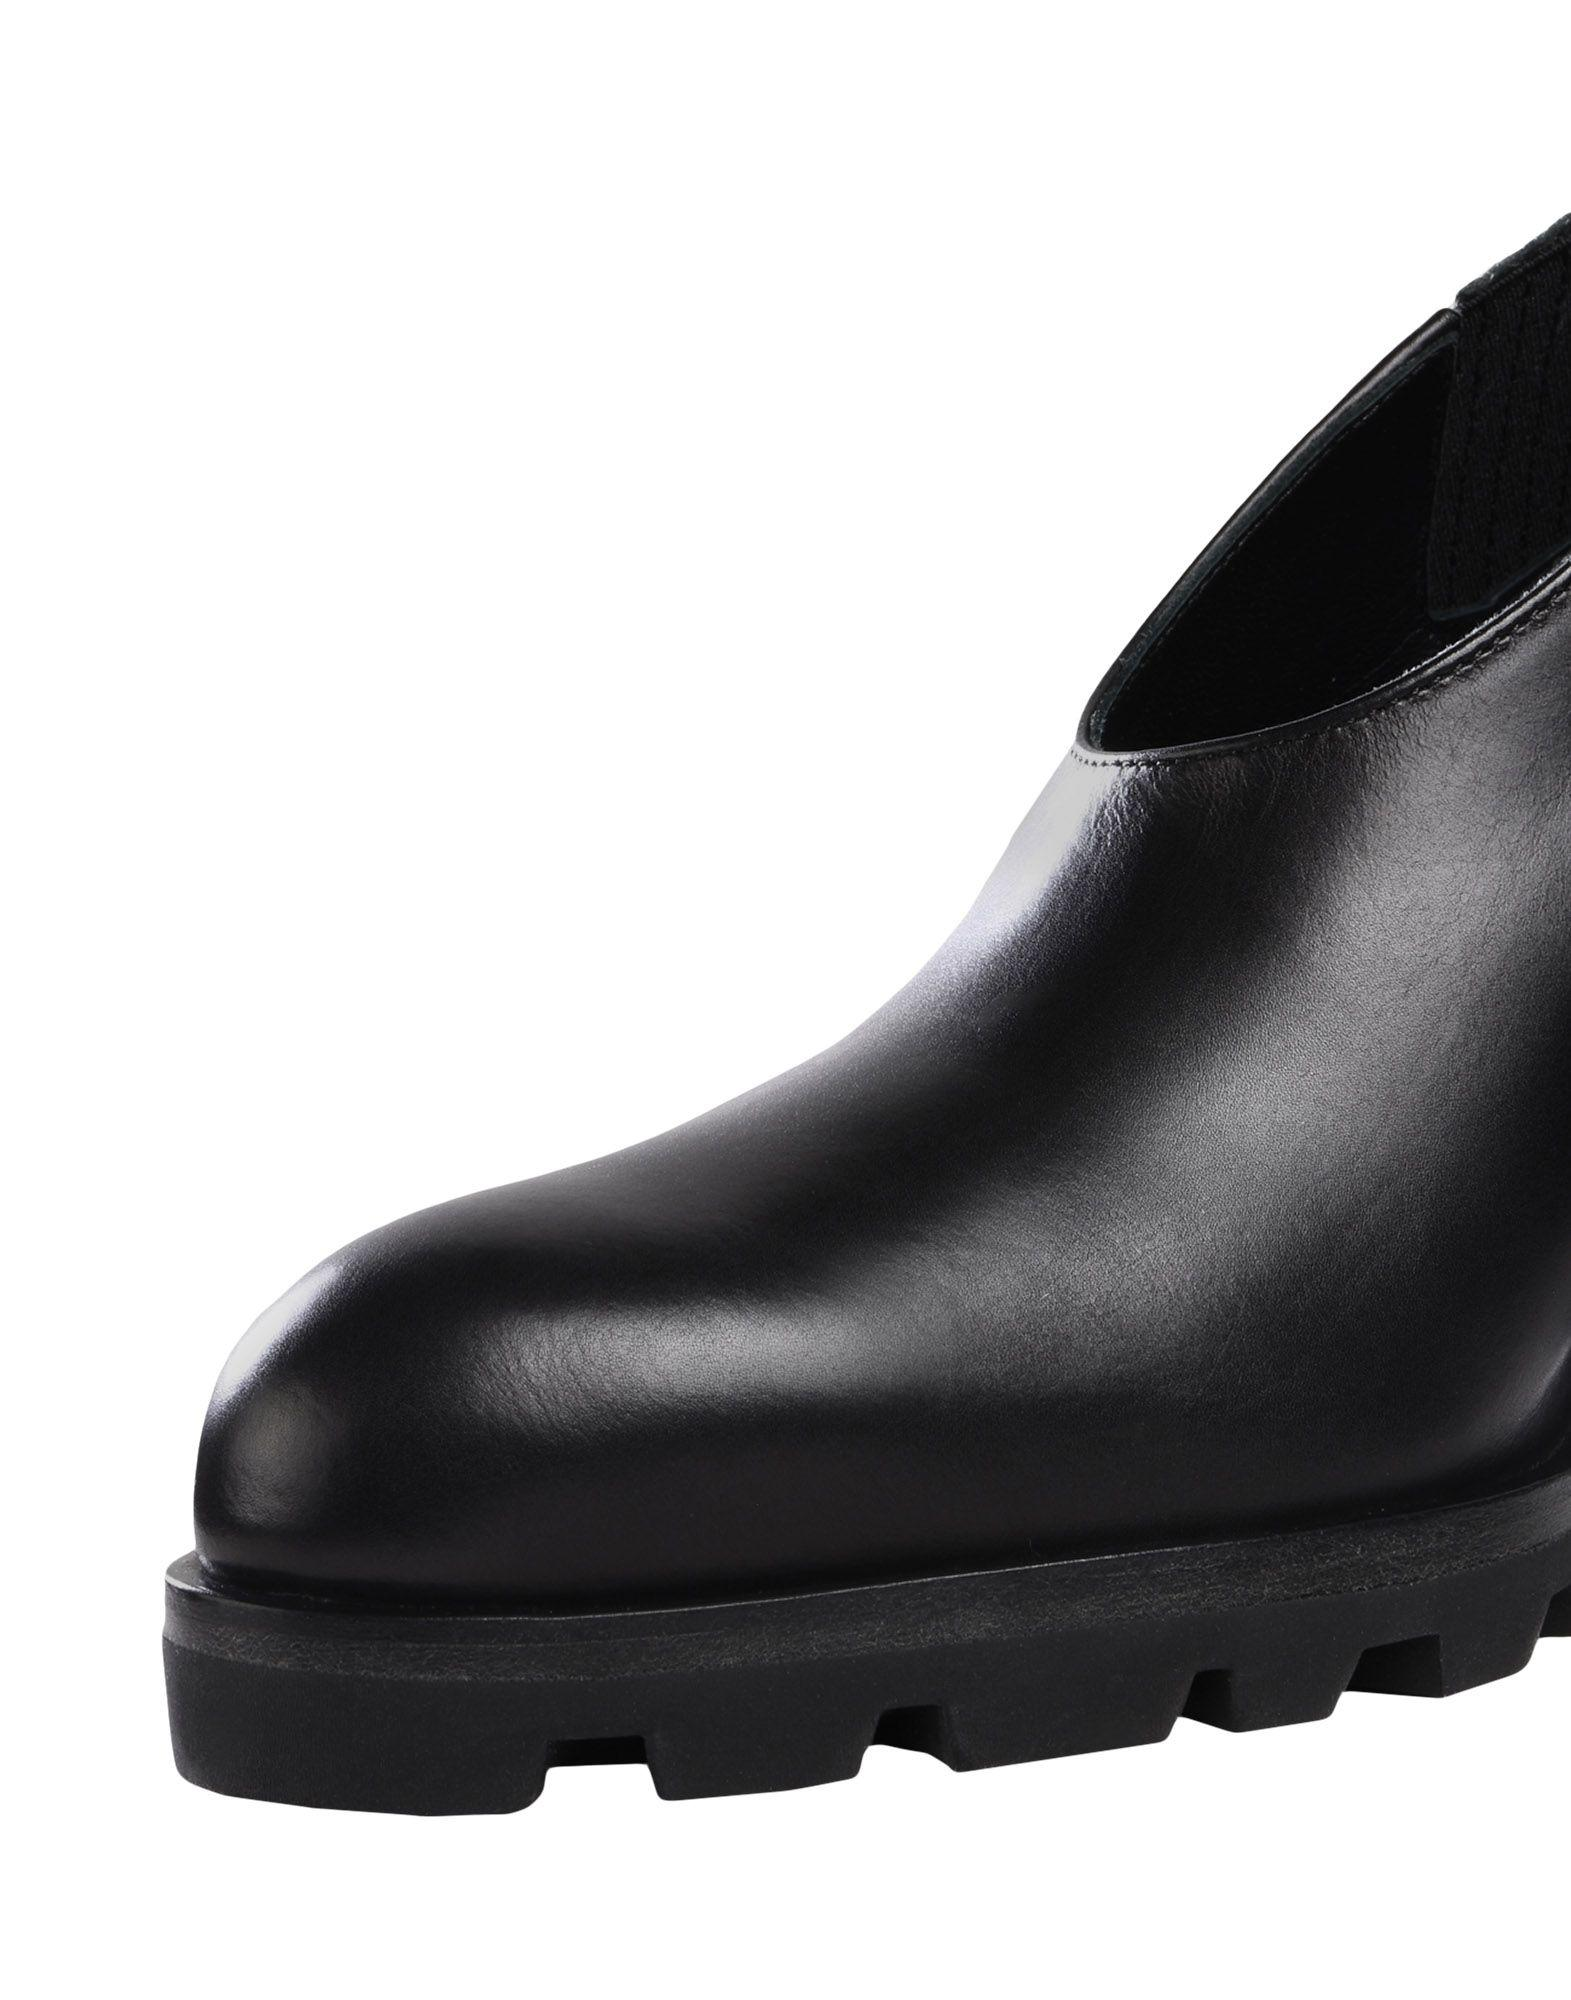 Jil Sander Leather Bootie in Black